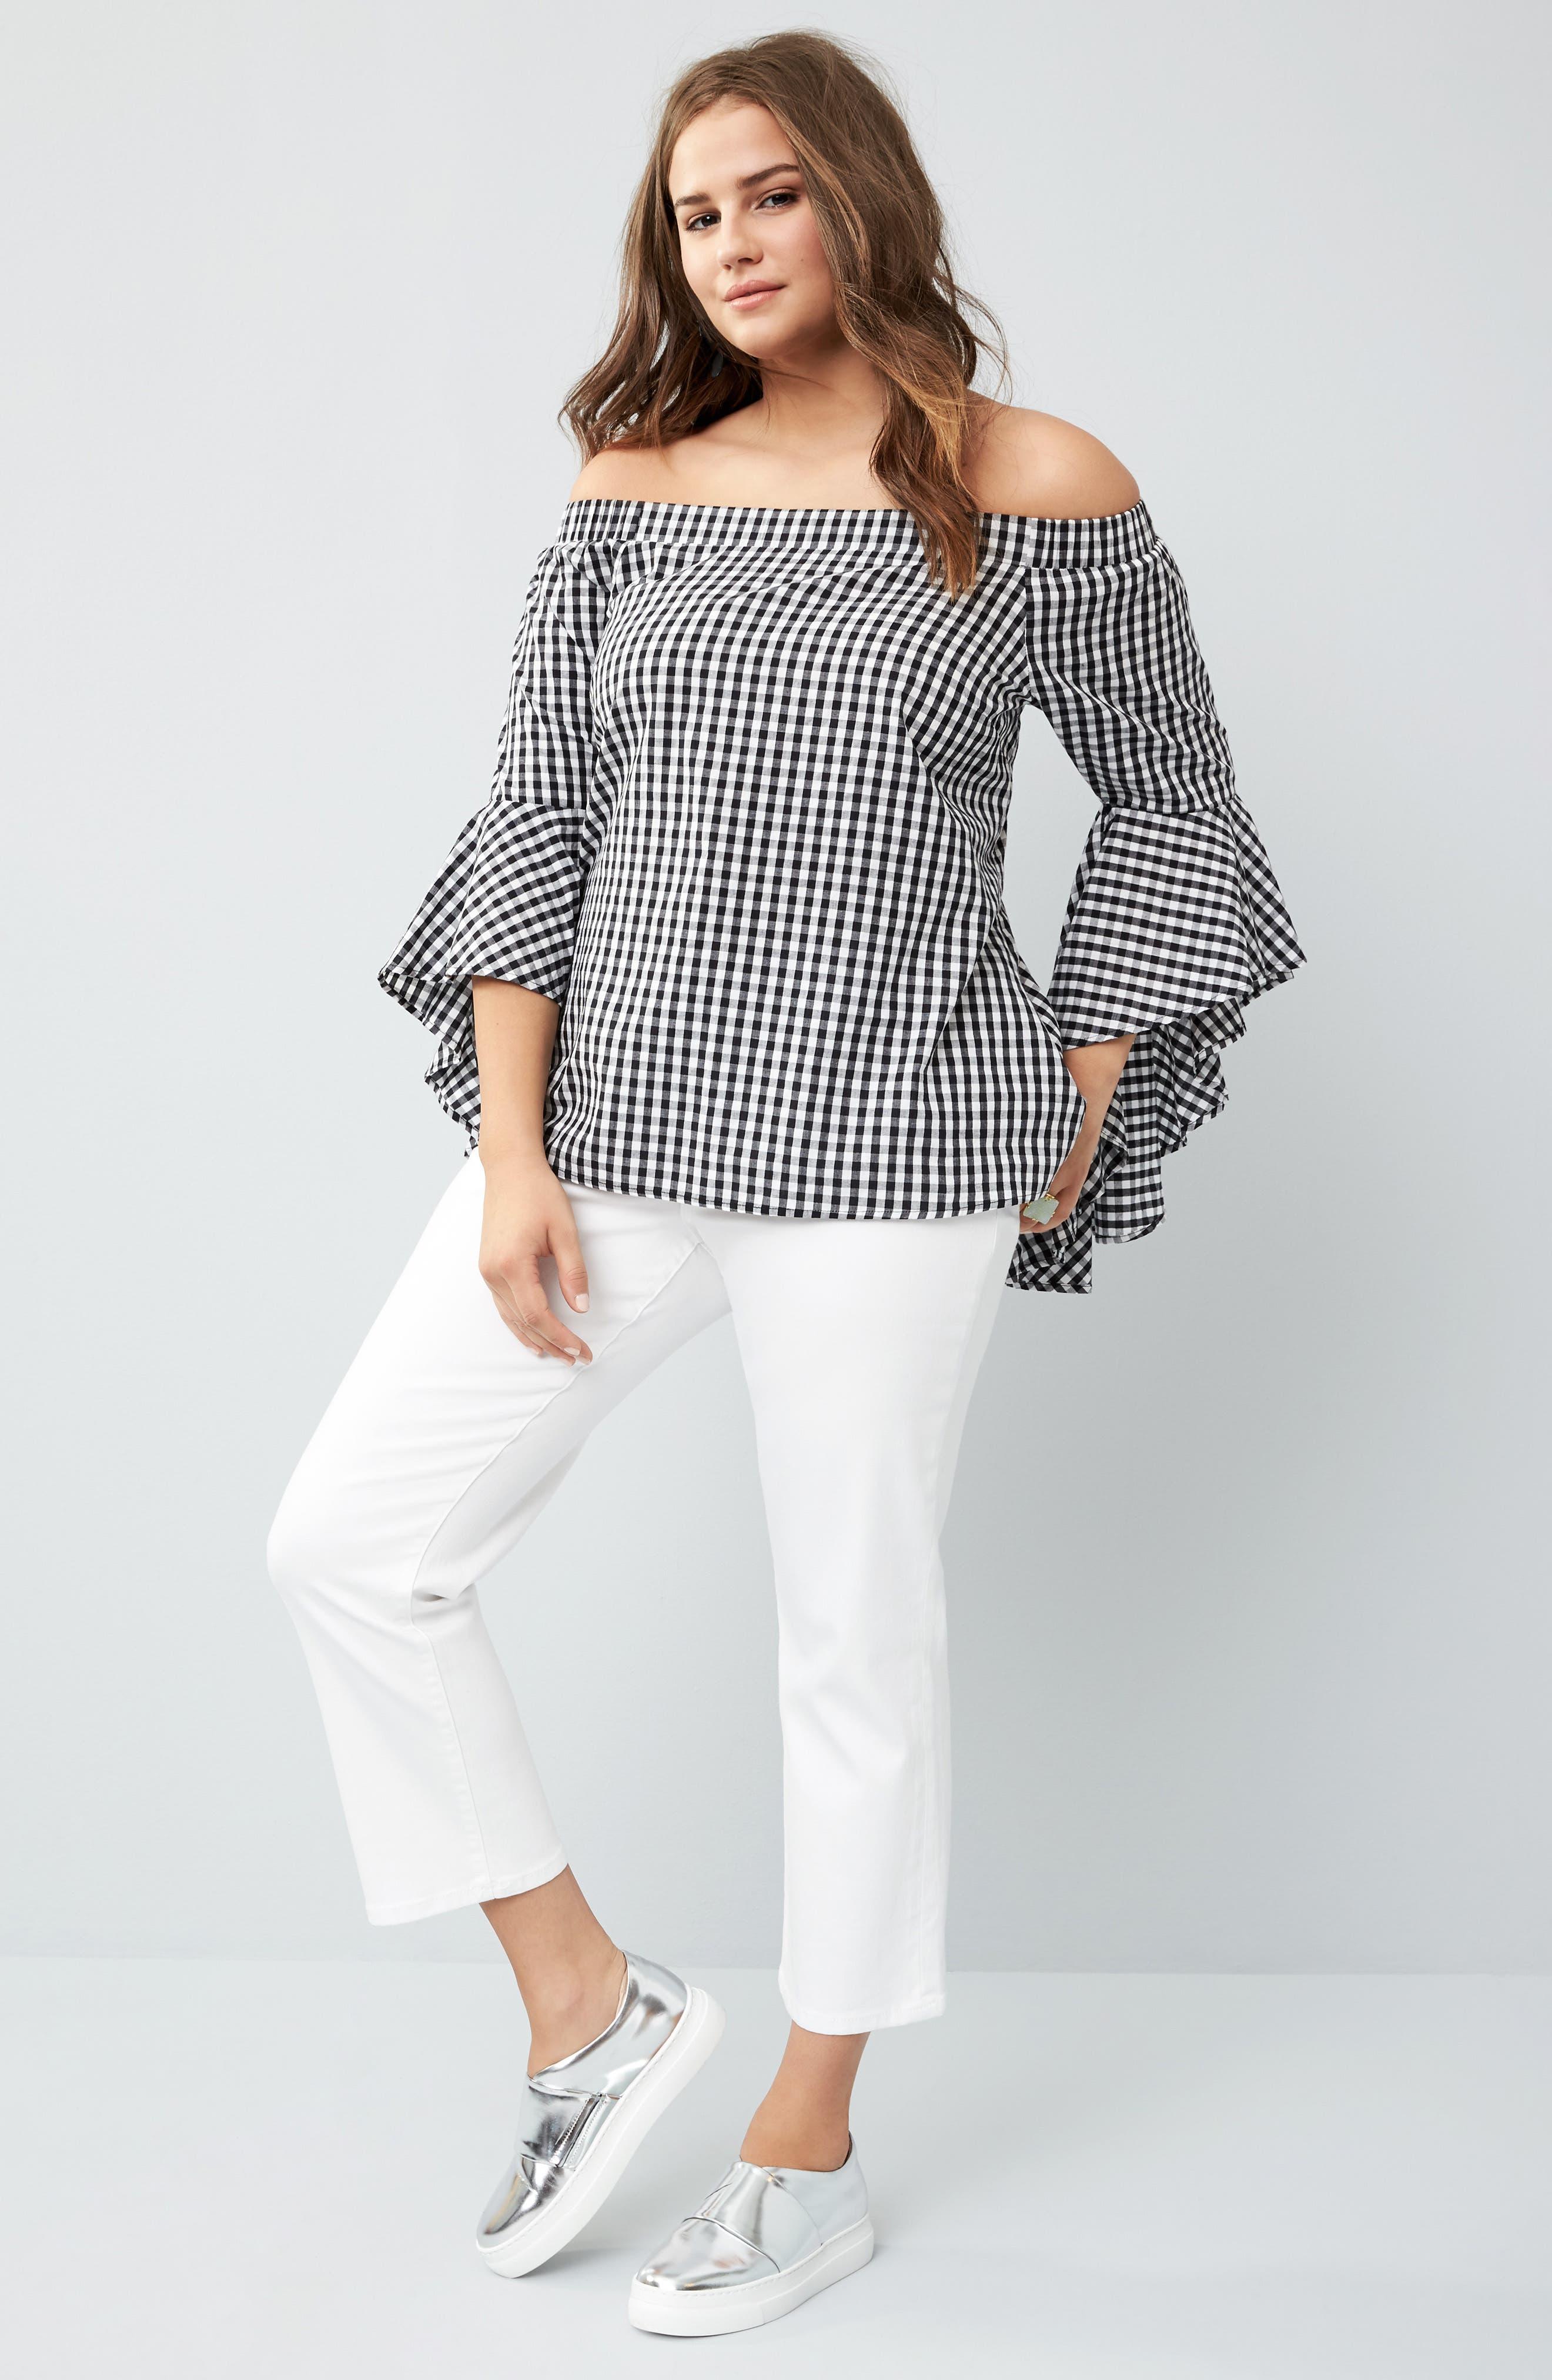 Bell Sleeve Off the Shoulder Shirt,                             Alternate thumbnail 2, color,                             Black / White